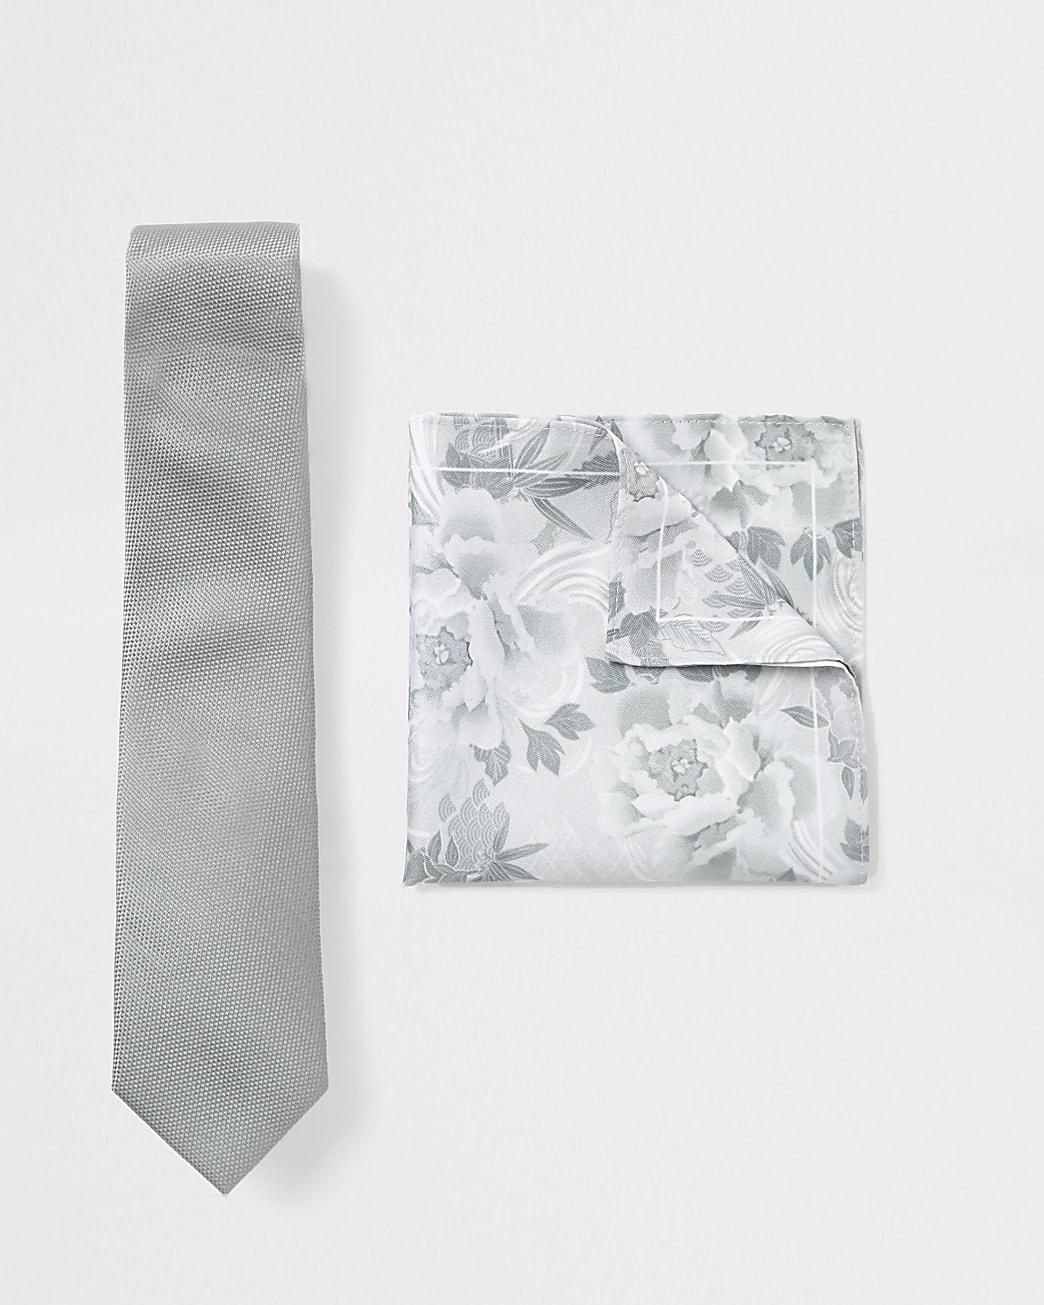 Green floral tie and handkerchief set